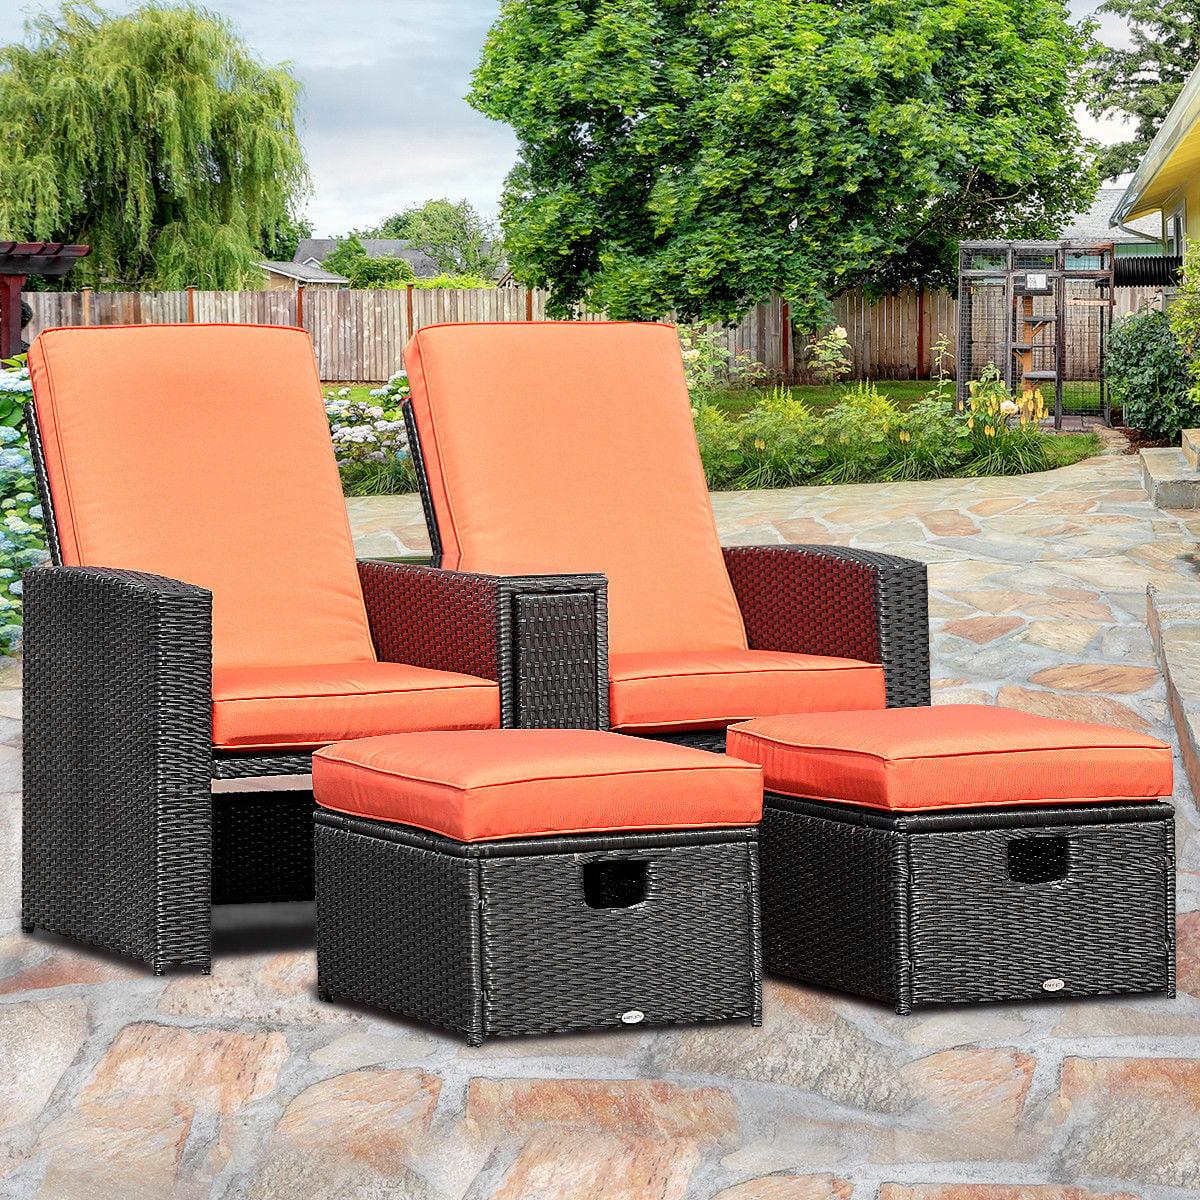 recliner patio chair leopard print office cover gymax 3pcs furniture reclining set adjustable backrest rattan ottoman walmart com